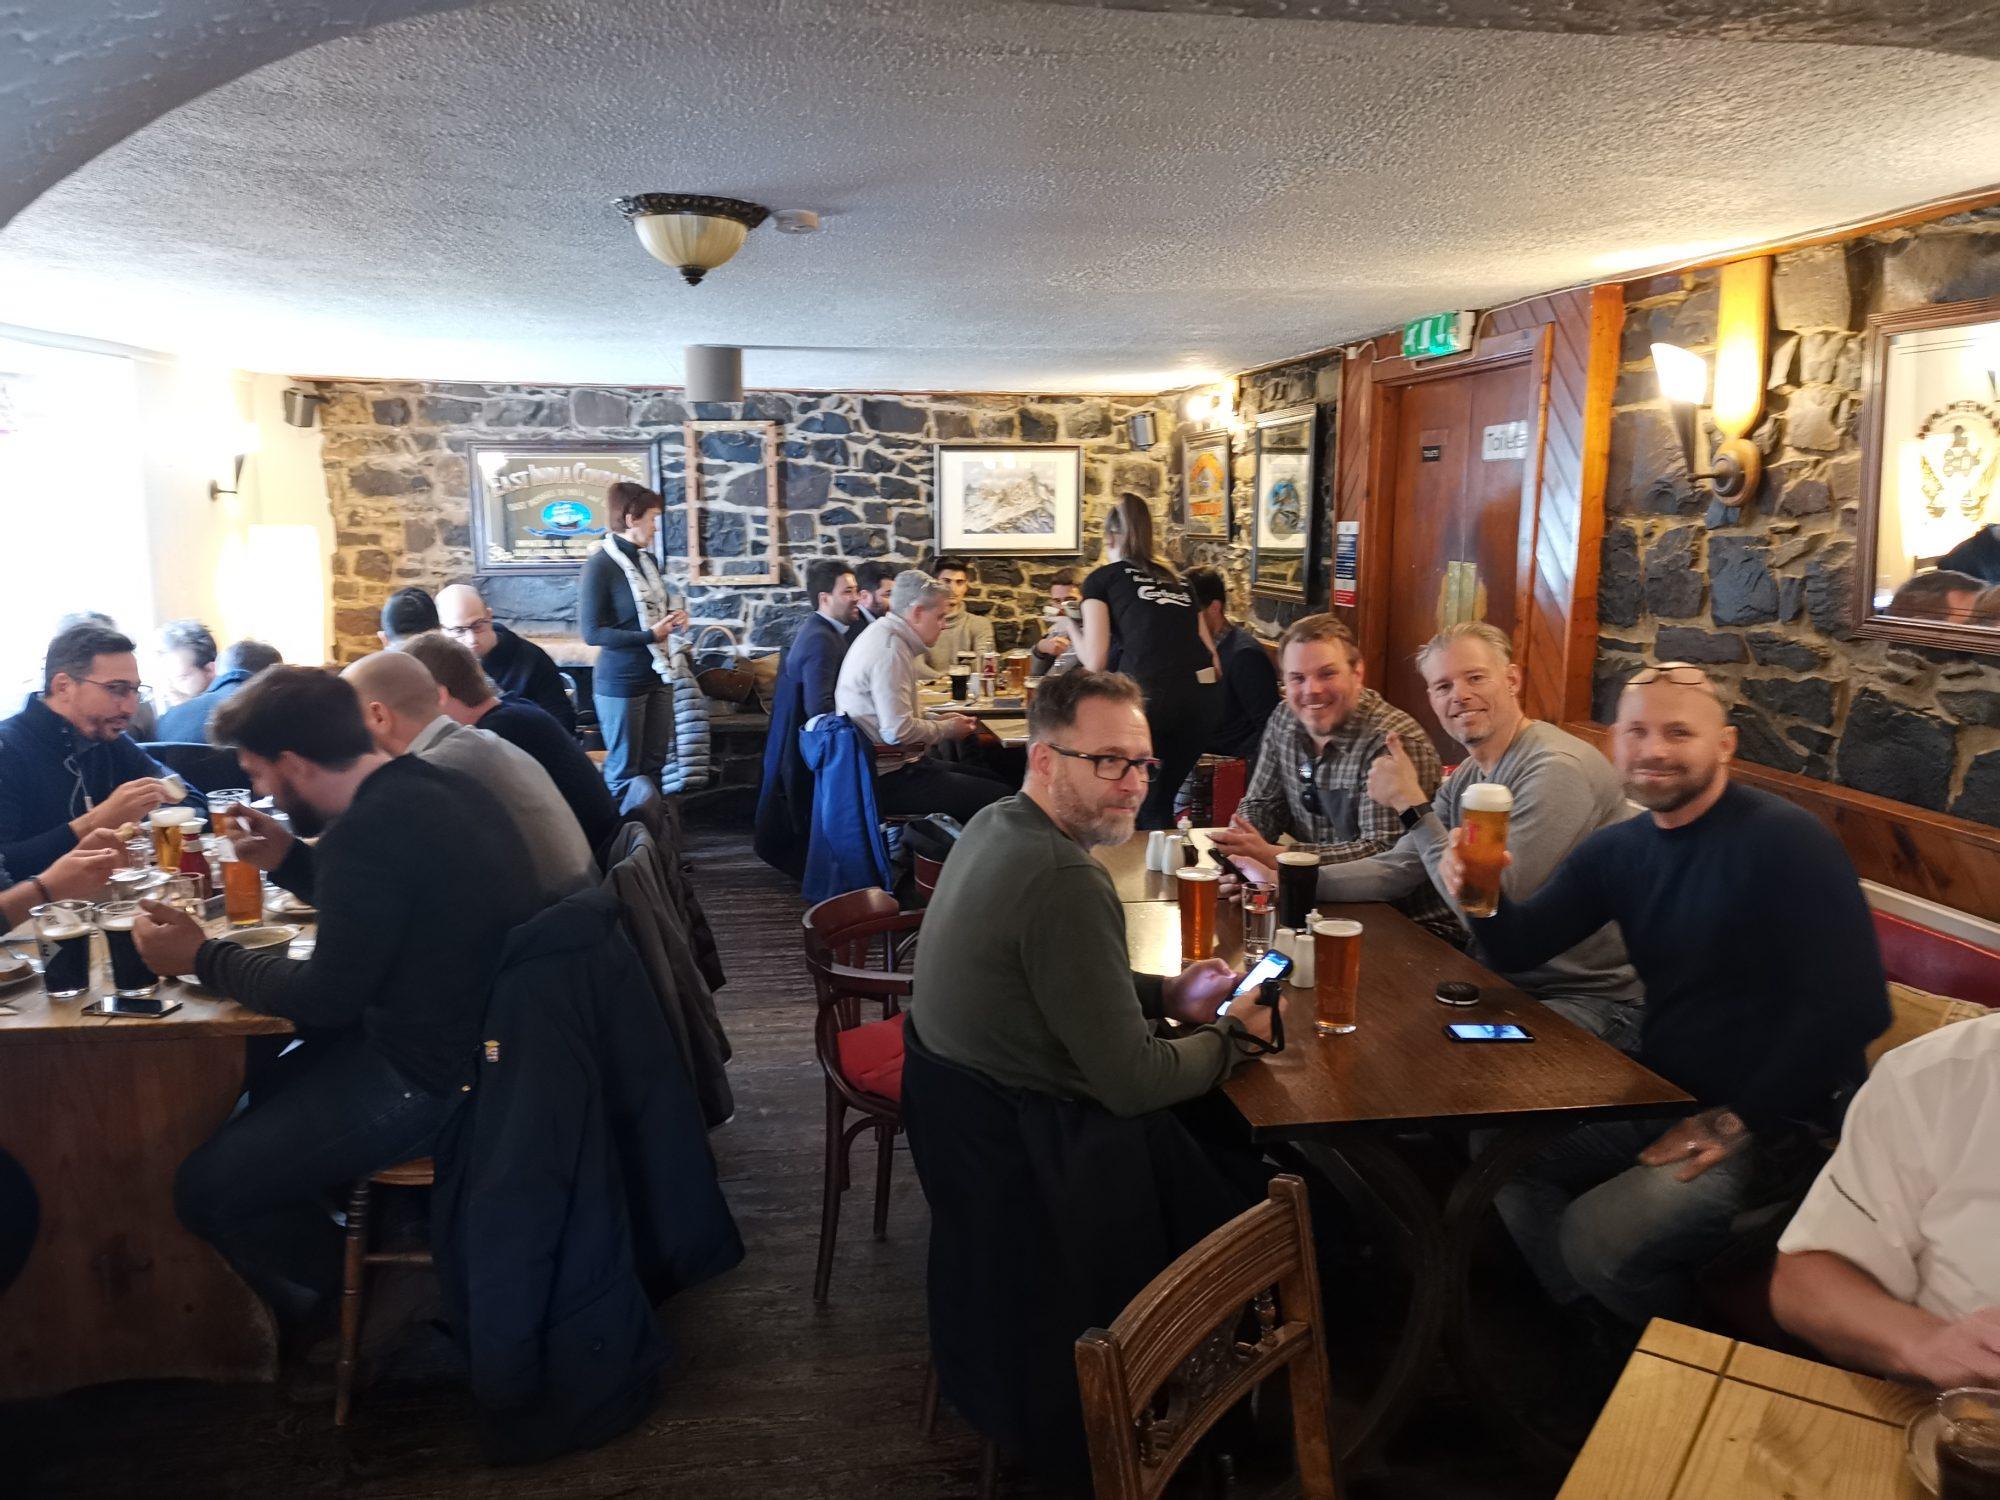 Lunch vid Talisker på Old Inn